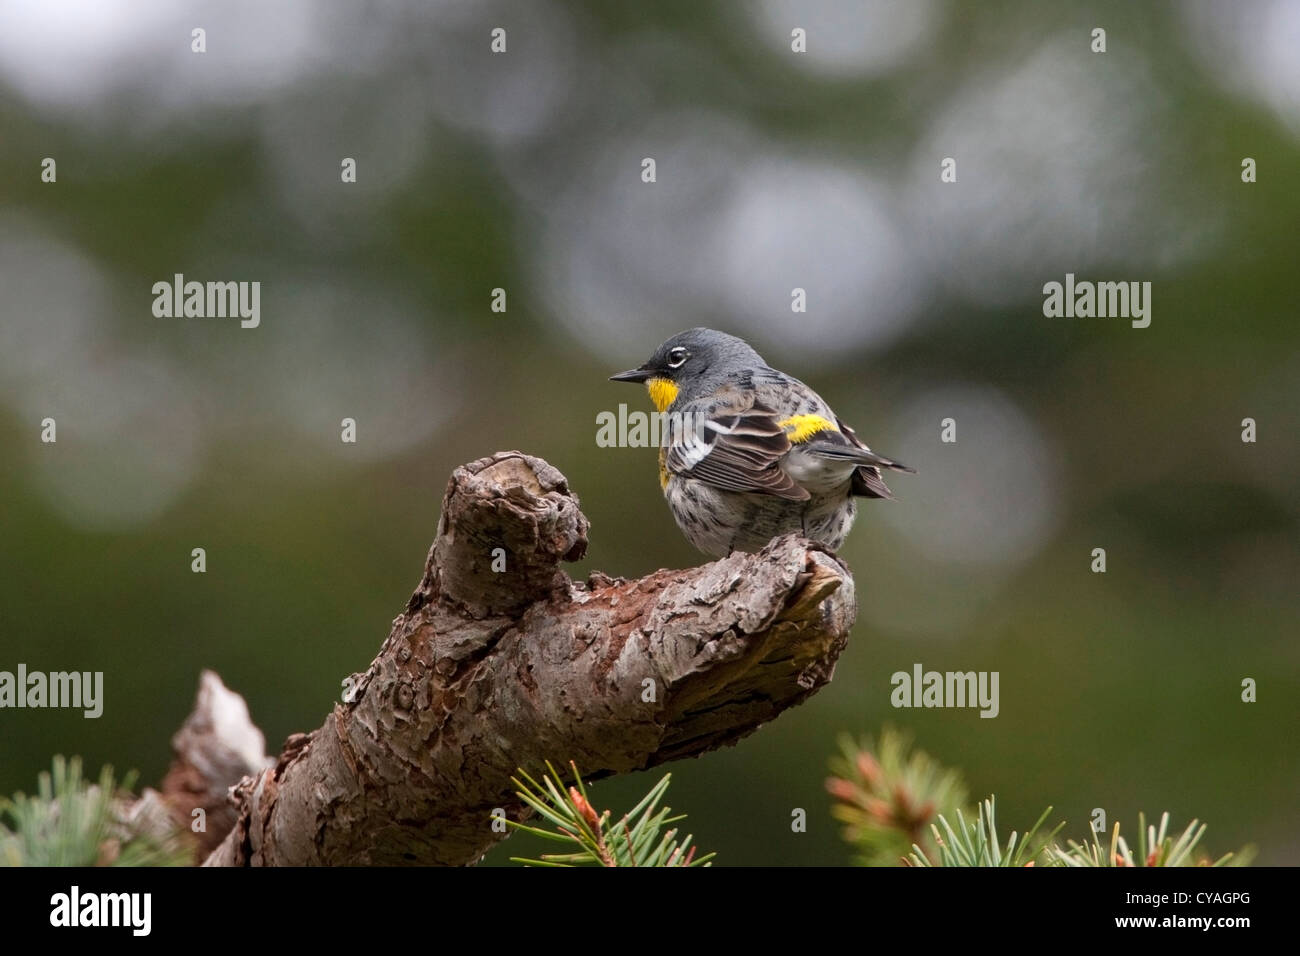 Yellow-rumped Warbler (Setophaga coronata) male Audubon's (auduboni) perched on log at Quadra Island, BC, Canada Stock Photo